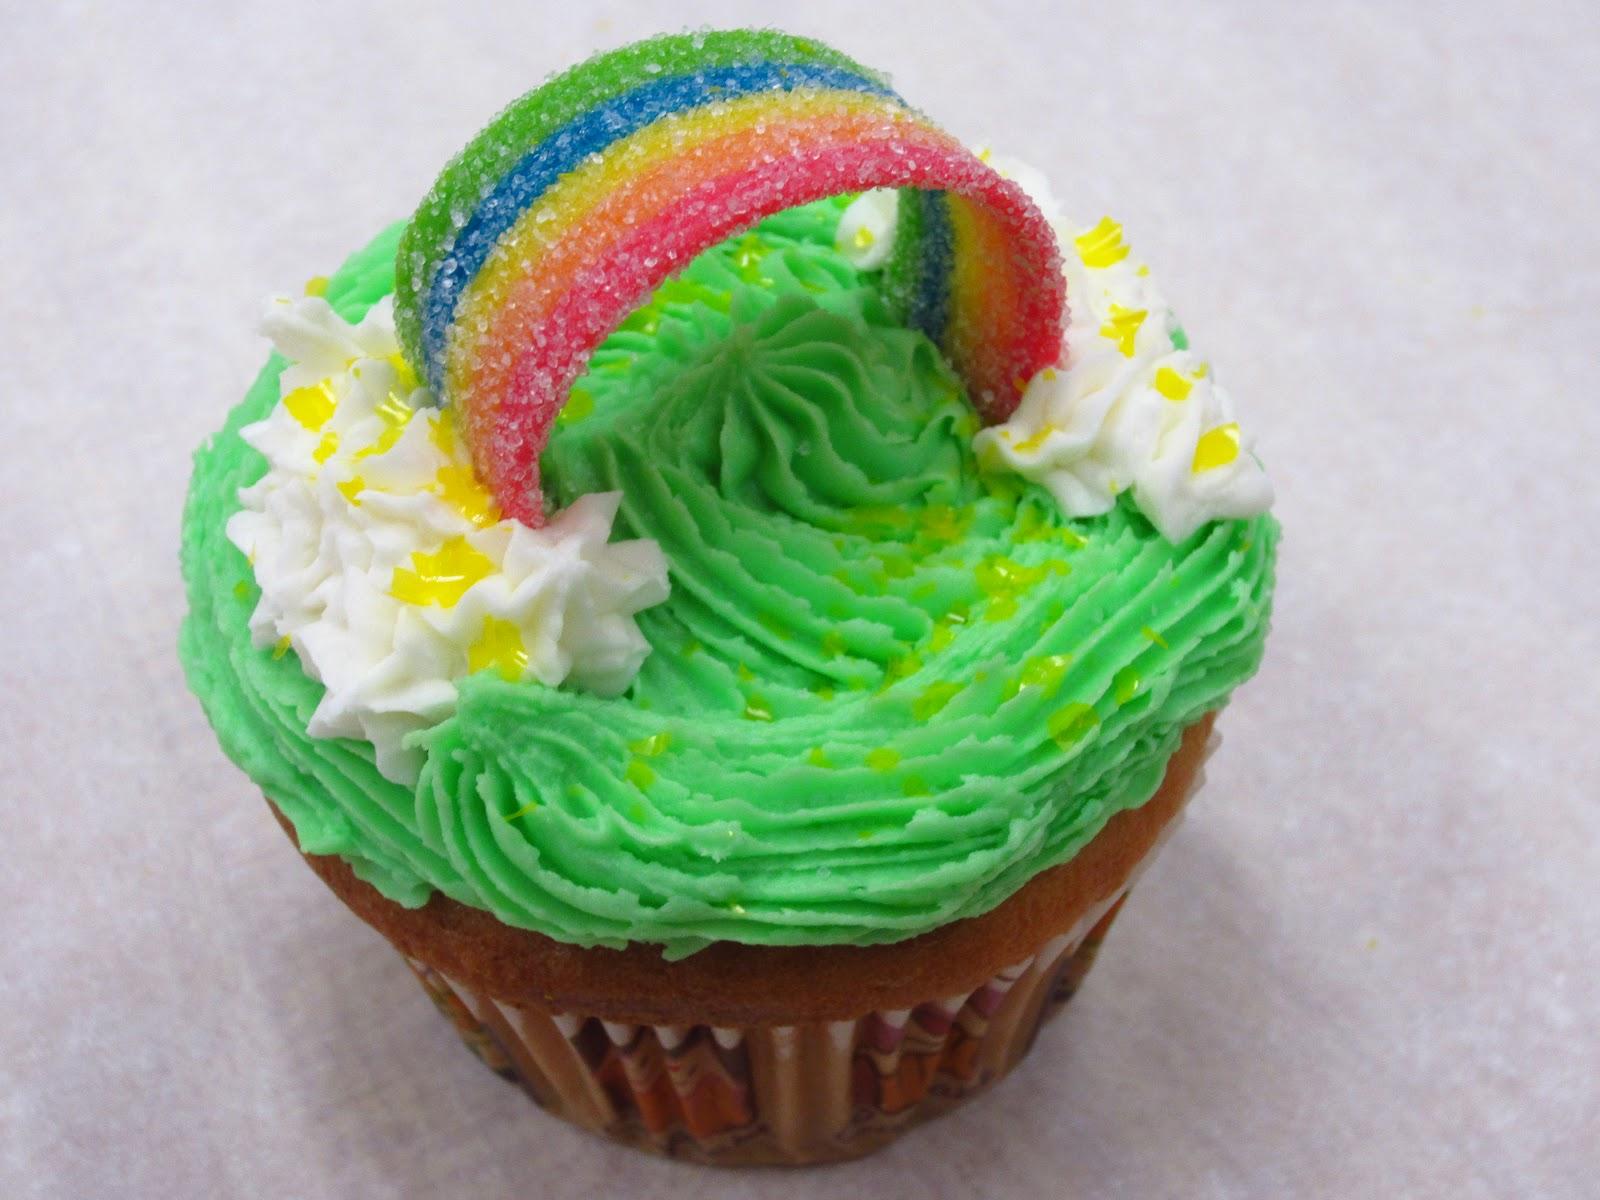 Ergo Rainbow Cupcakes For St Pattys Day